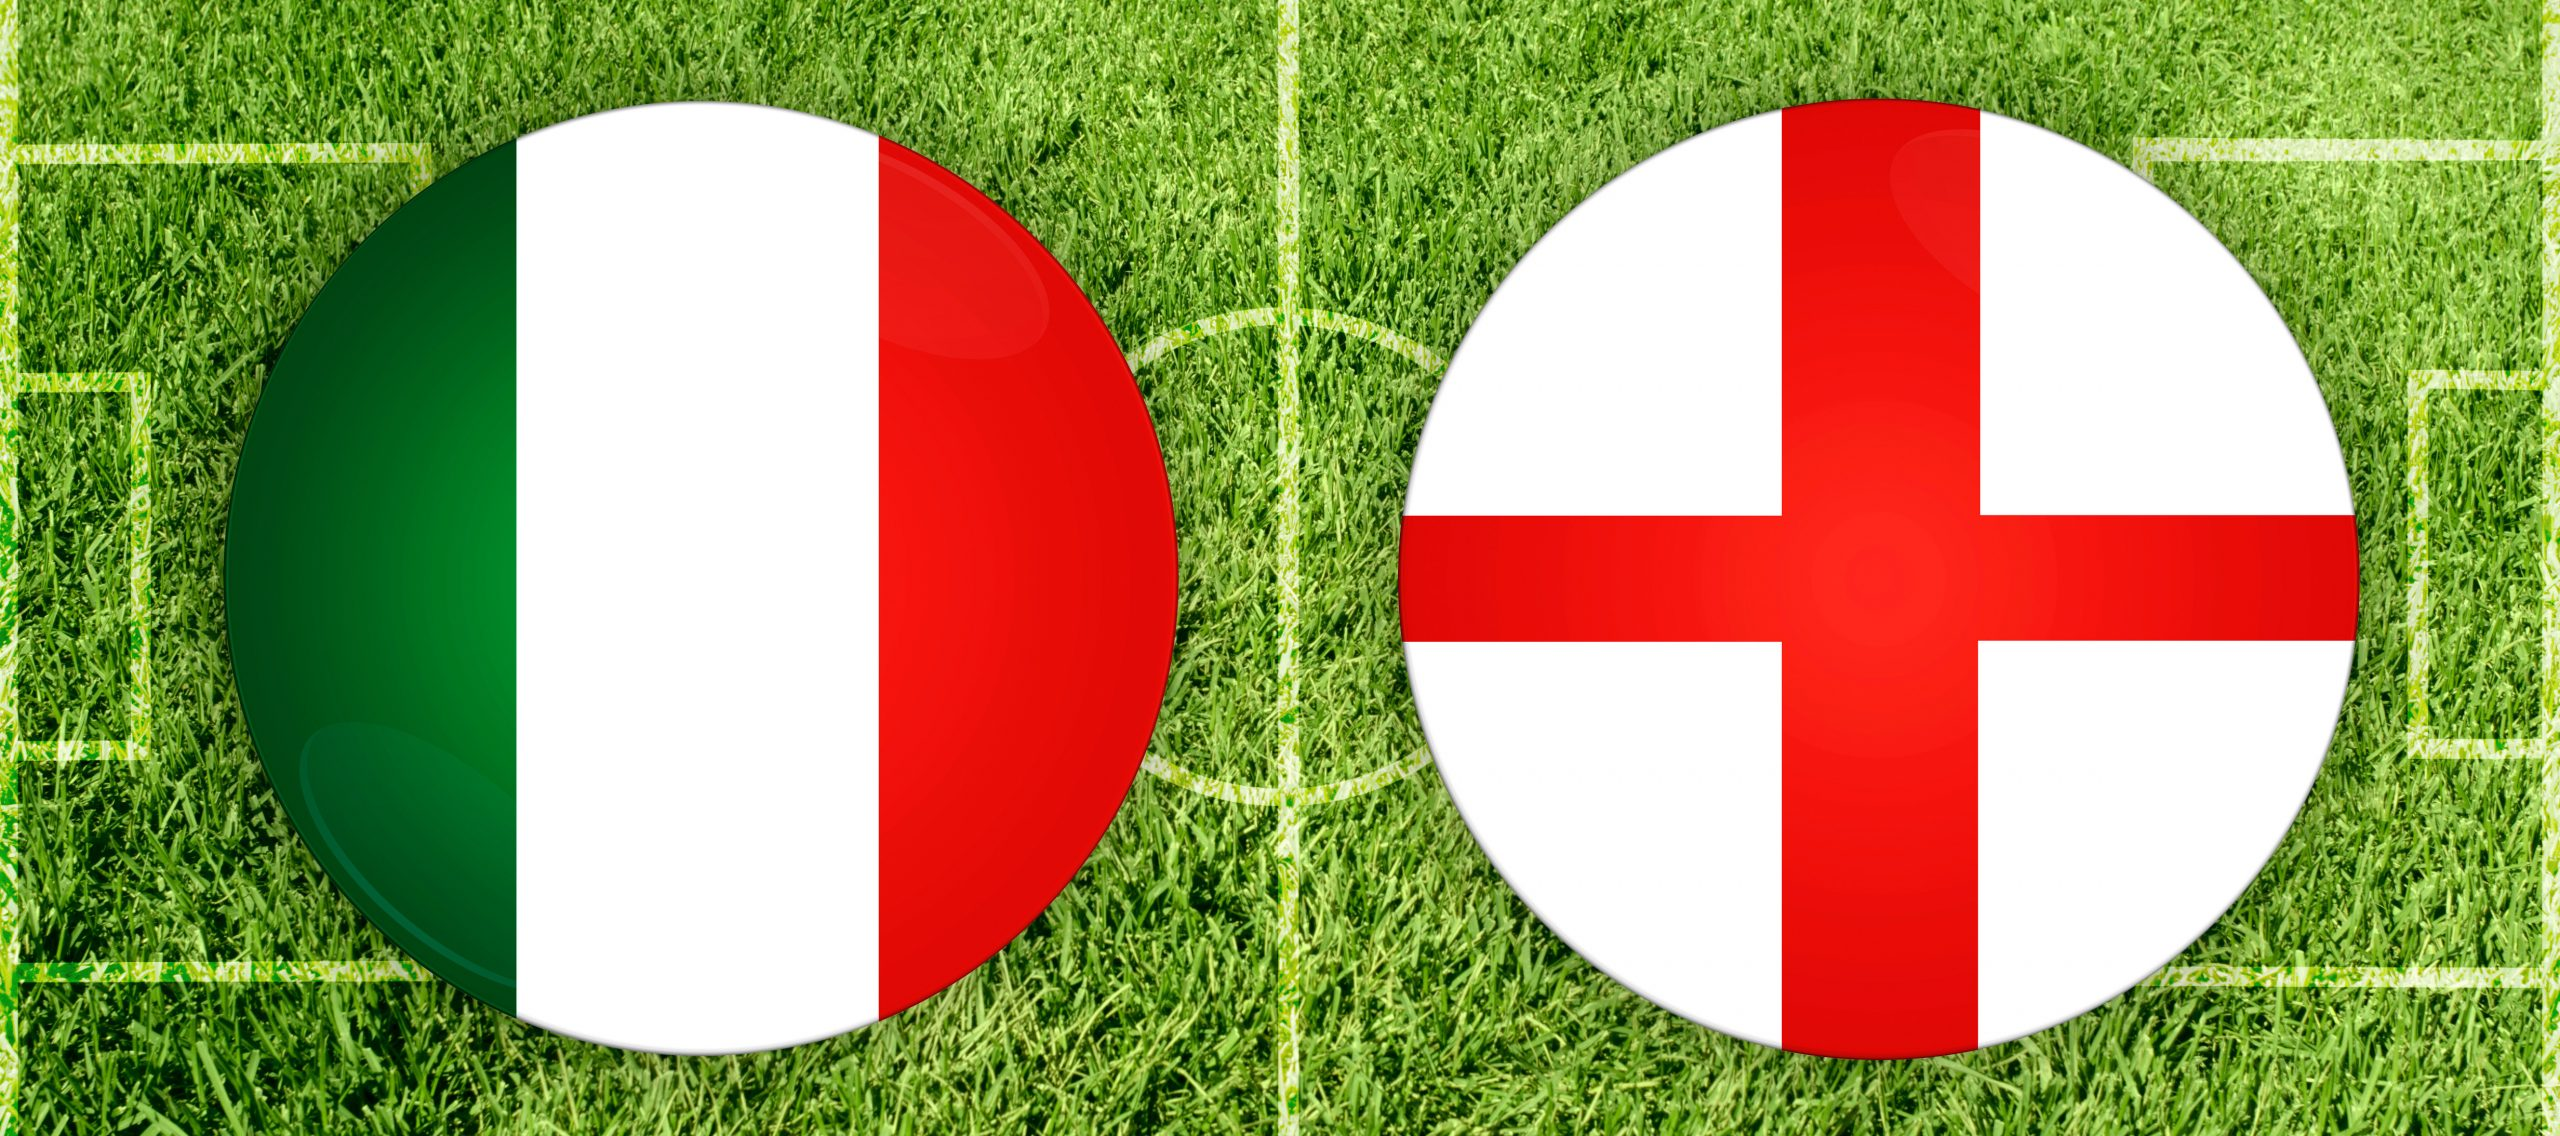 Euros Italy vs England